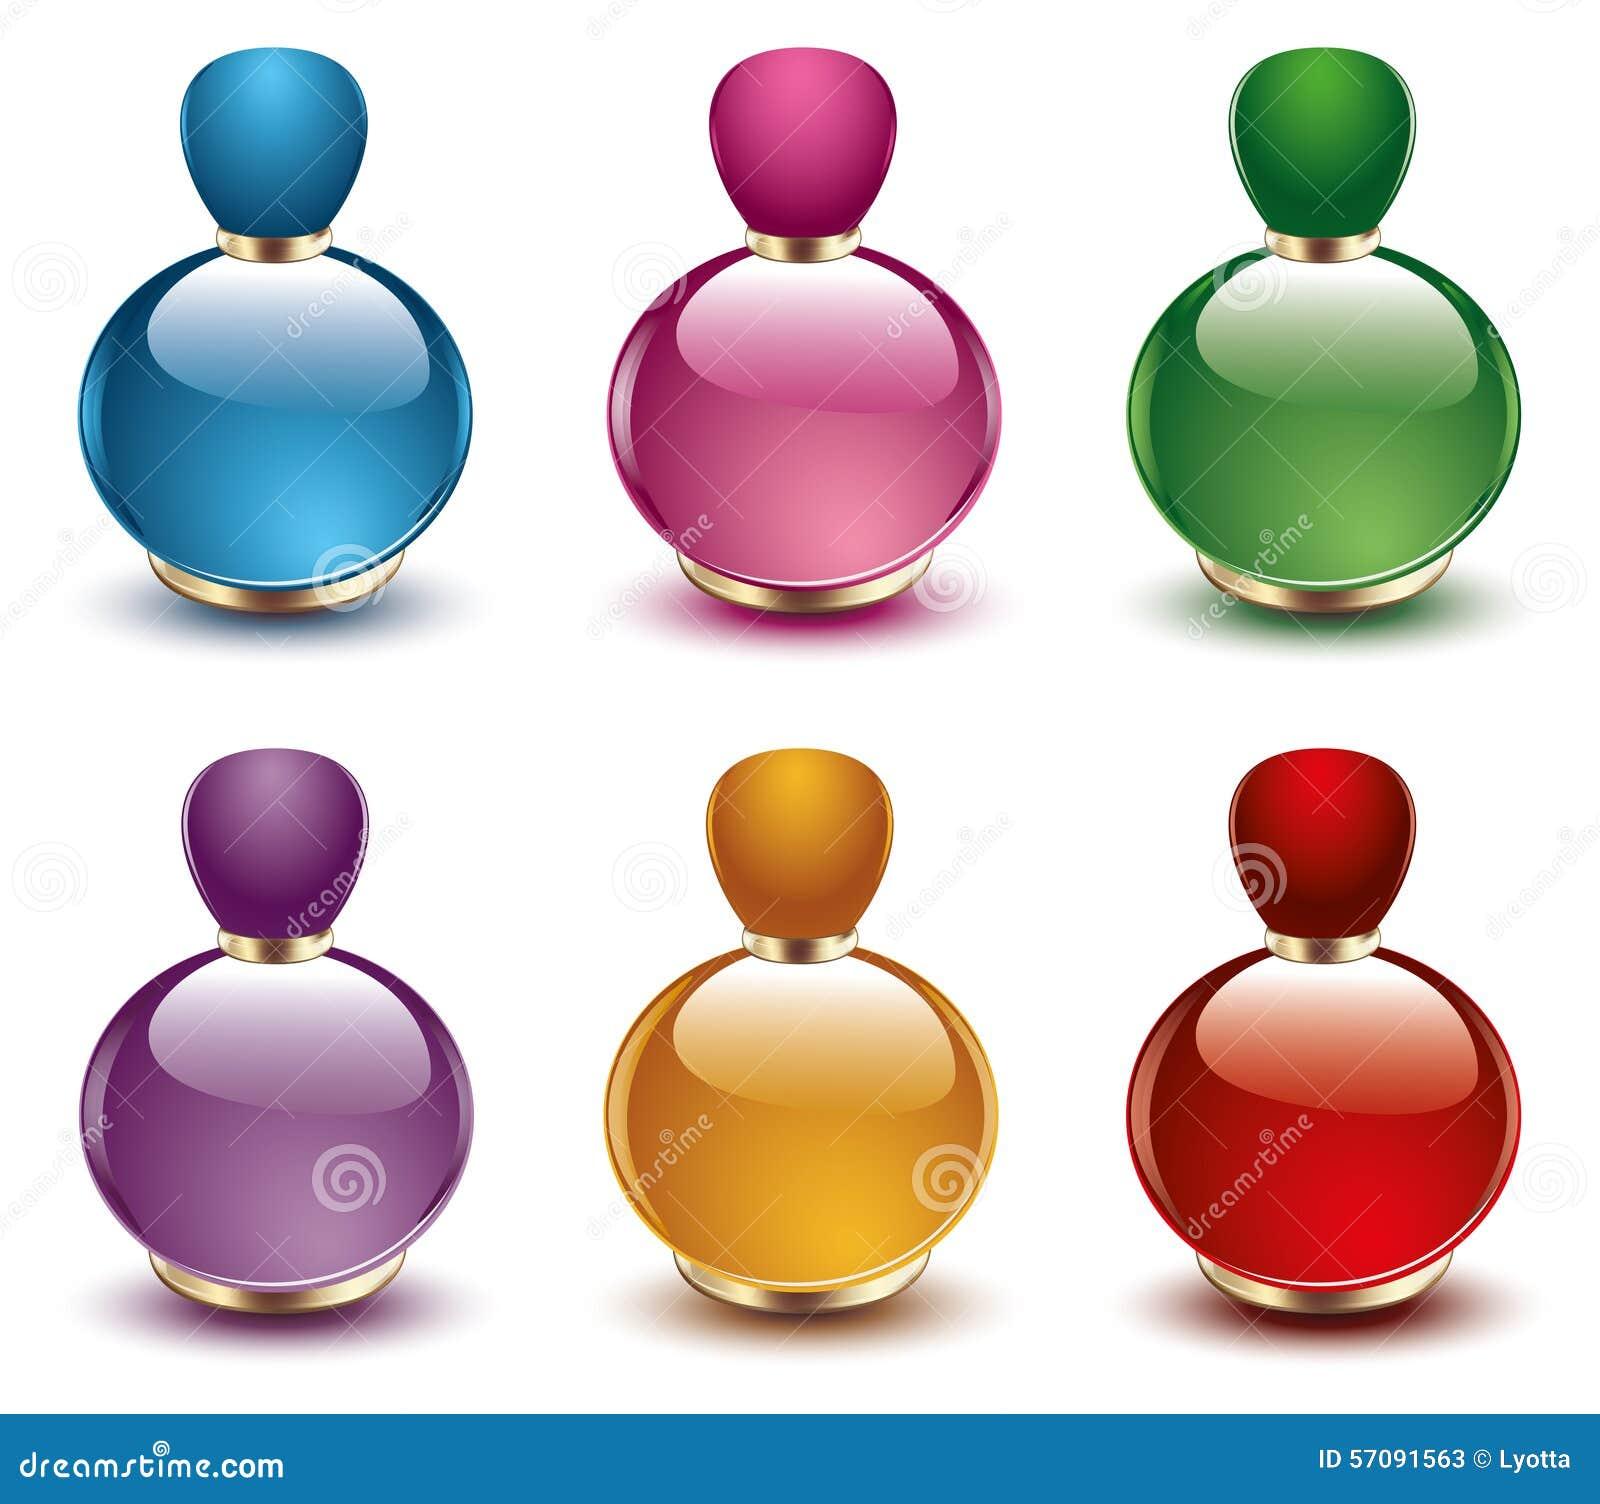 Perfume Bottles Vector Stock Vector. Illustration Of Gold